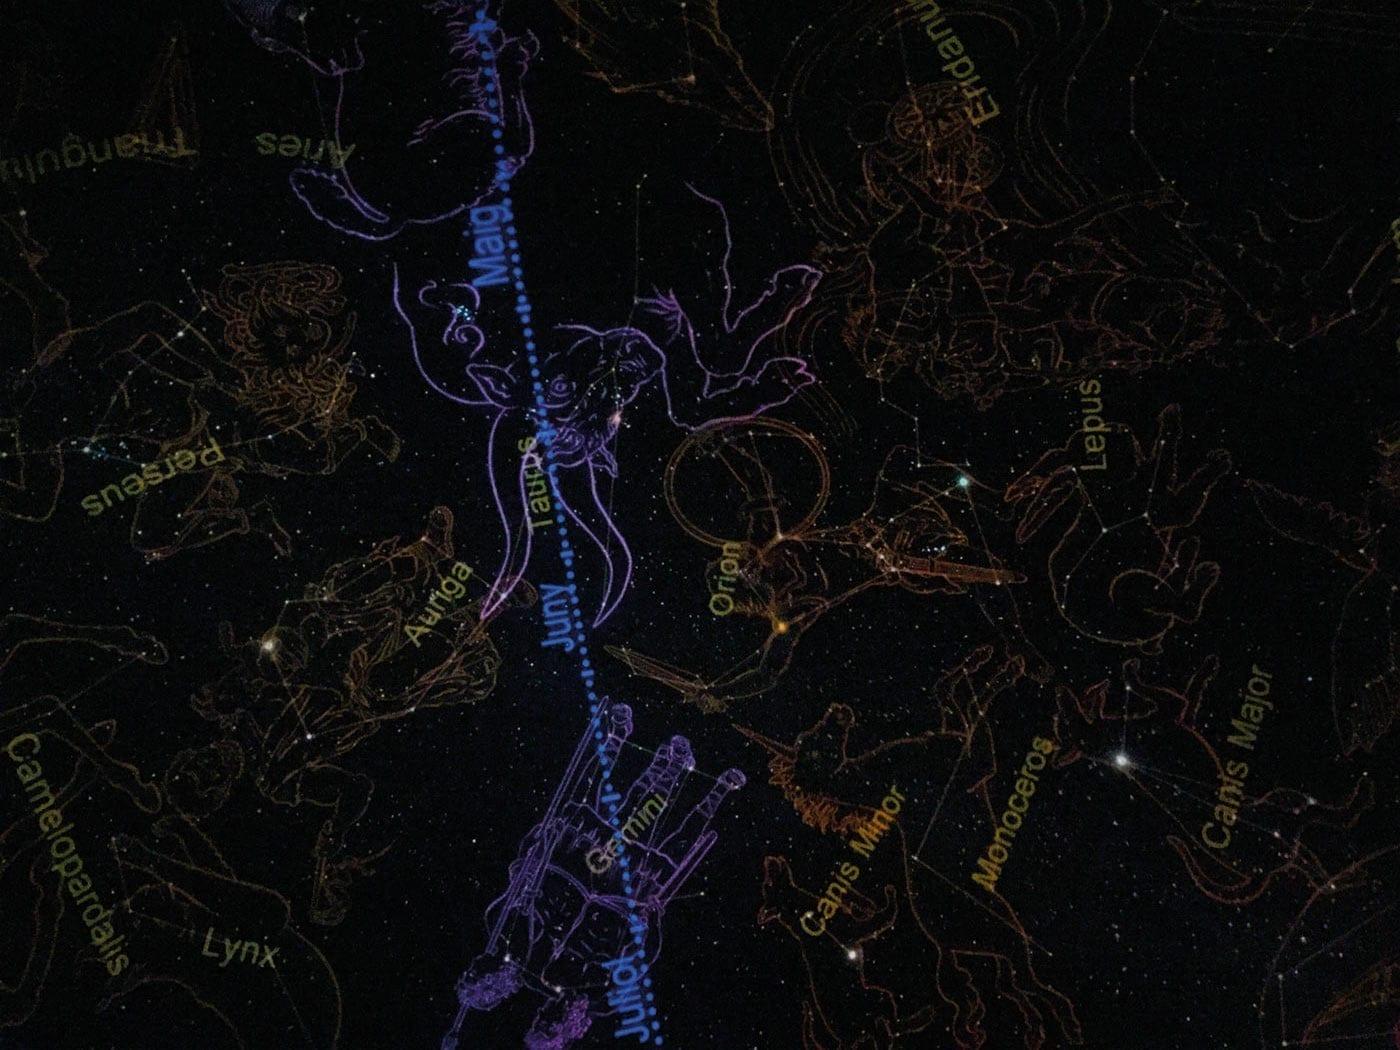 PAM, Montsec, astronomie, teleskop, sternenbild